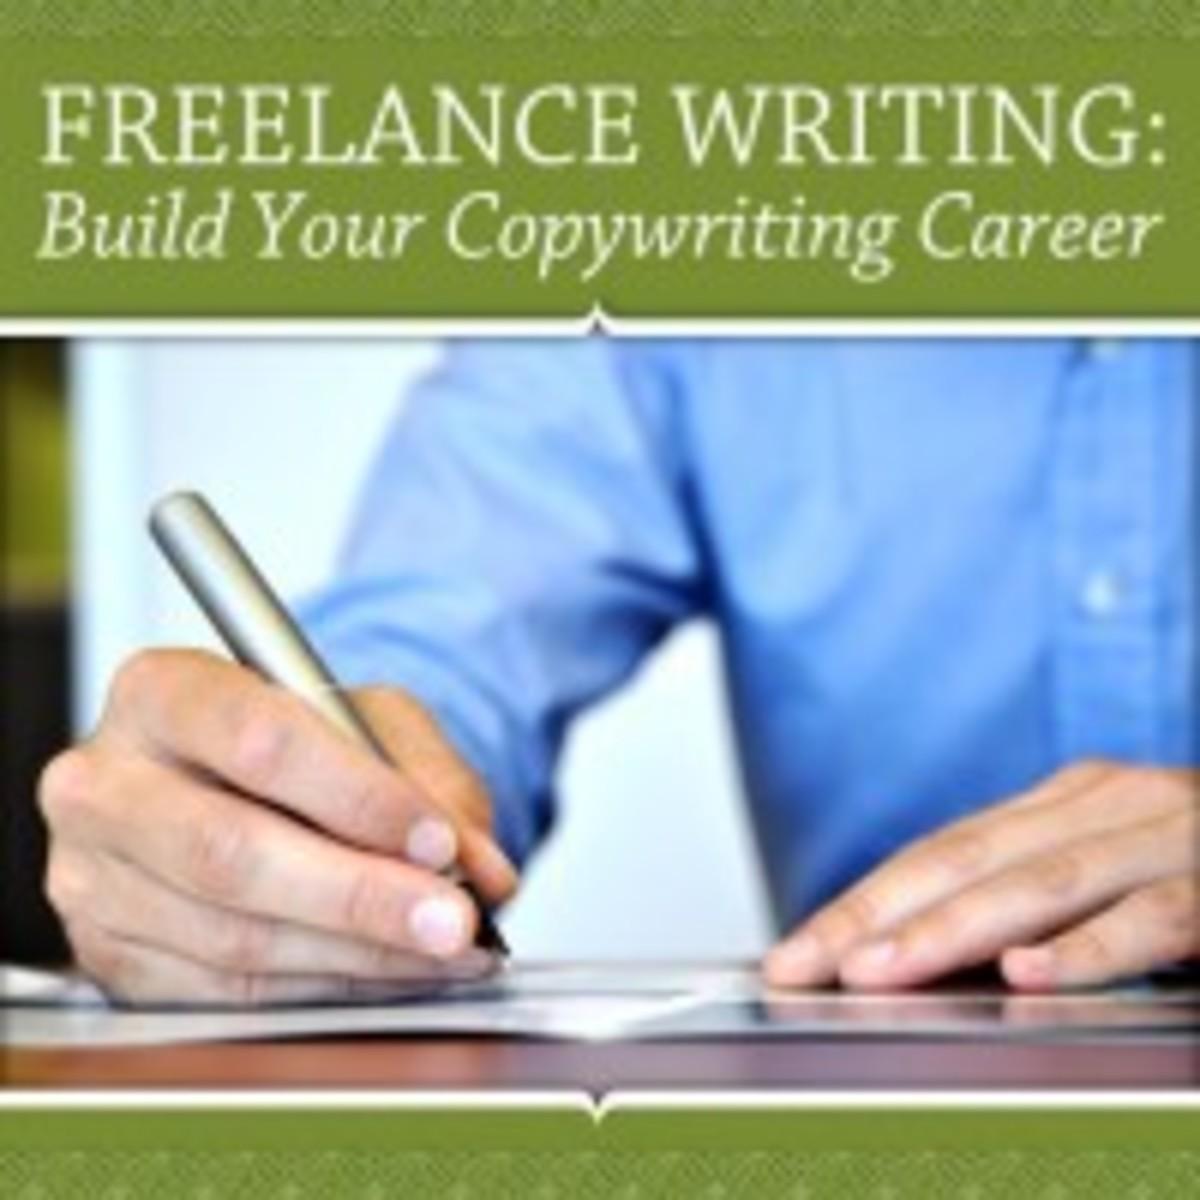 freelance-writing-cover